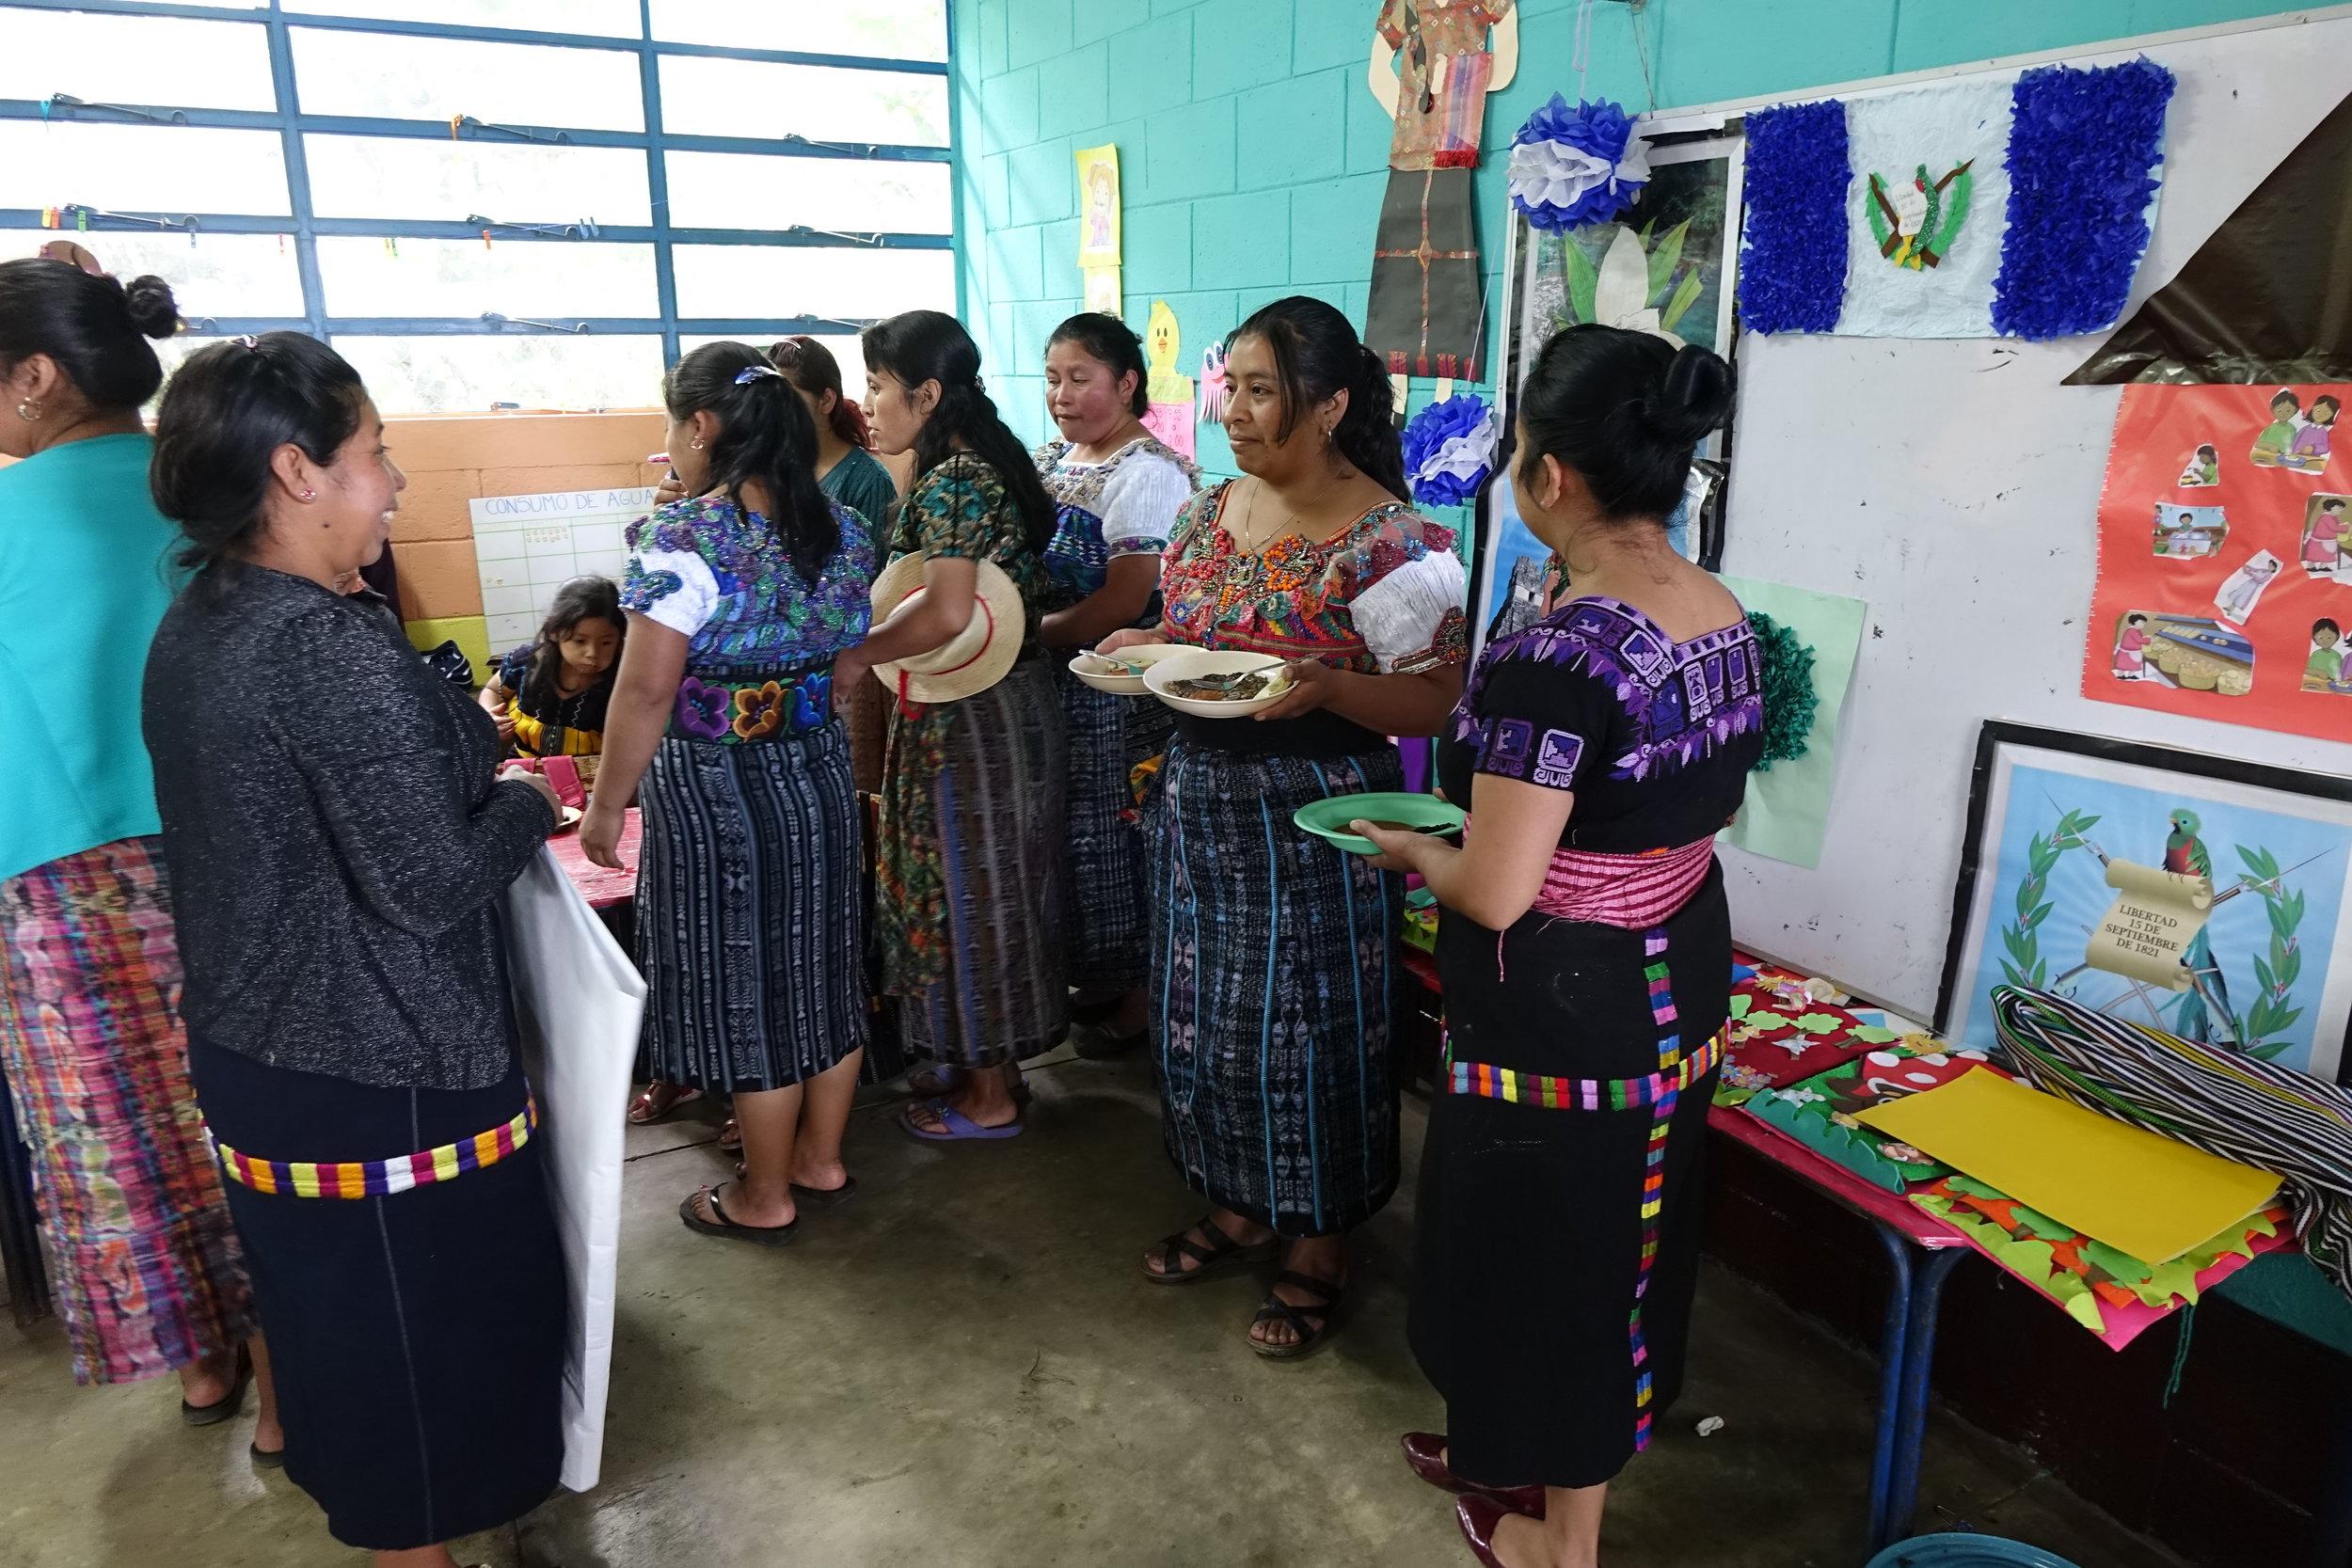 021_Guatemala_Vivamos Mejor CEIBI (86).JPG